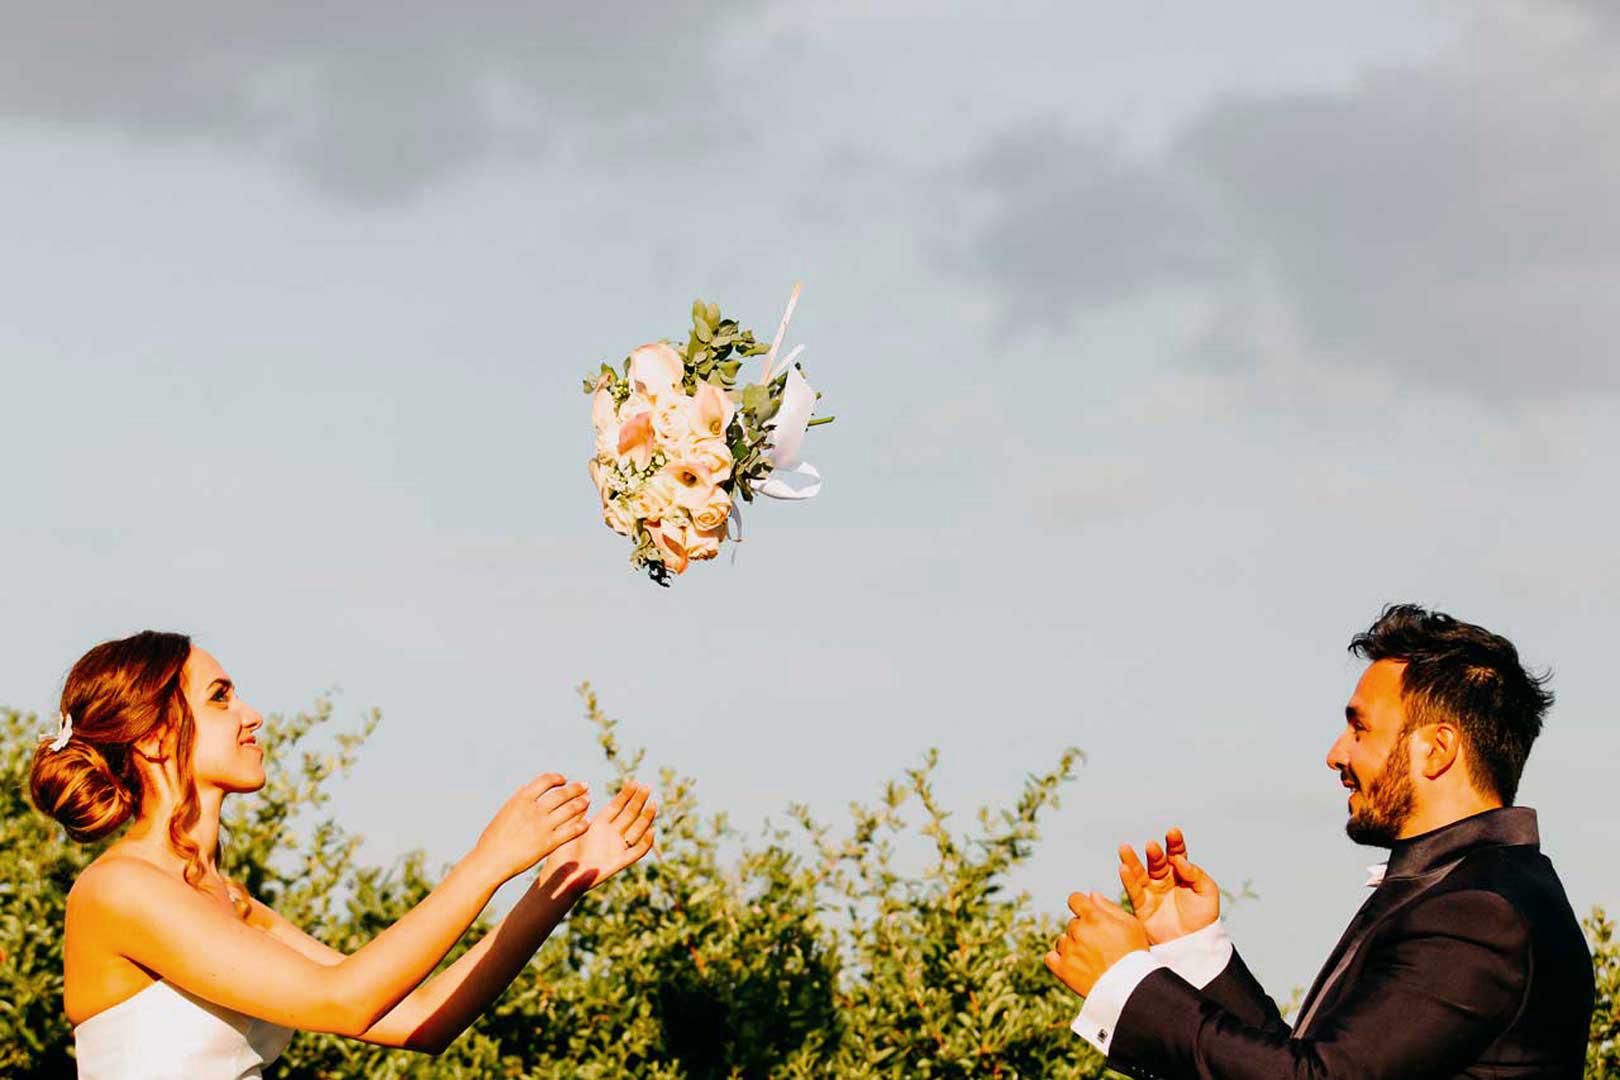 027-wedding-puglia-gianni-lepore